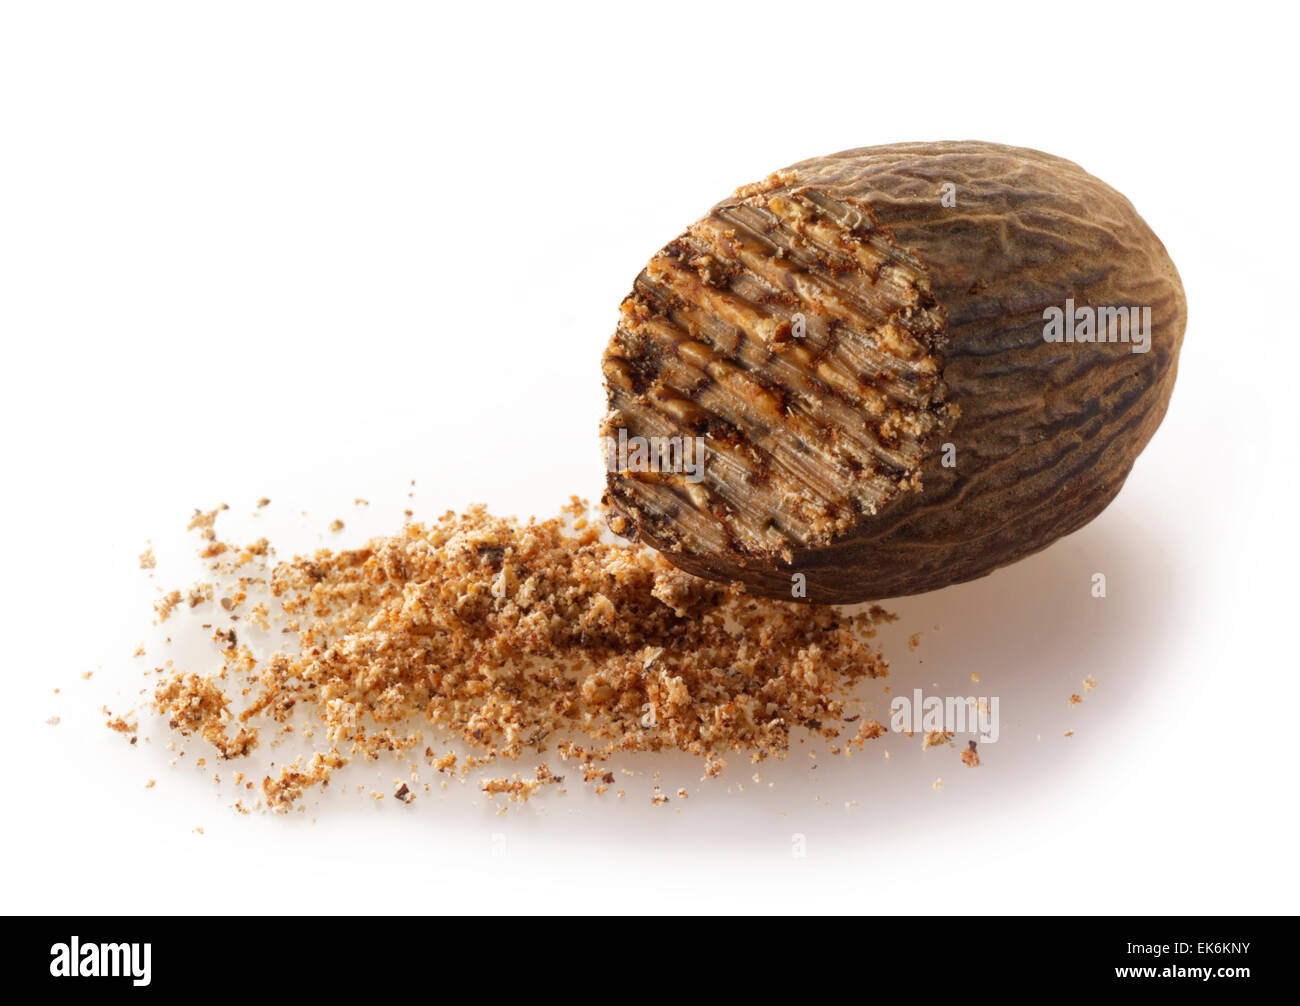 Whole fresh Nutmeg with ground nutmeg (Myristica fragrans)  composed arrangement isolated against a white background - Stock Image